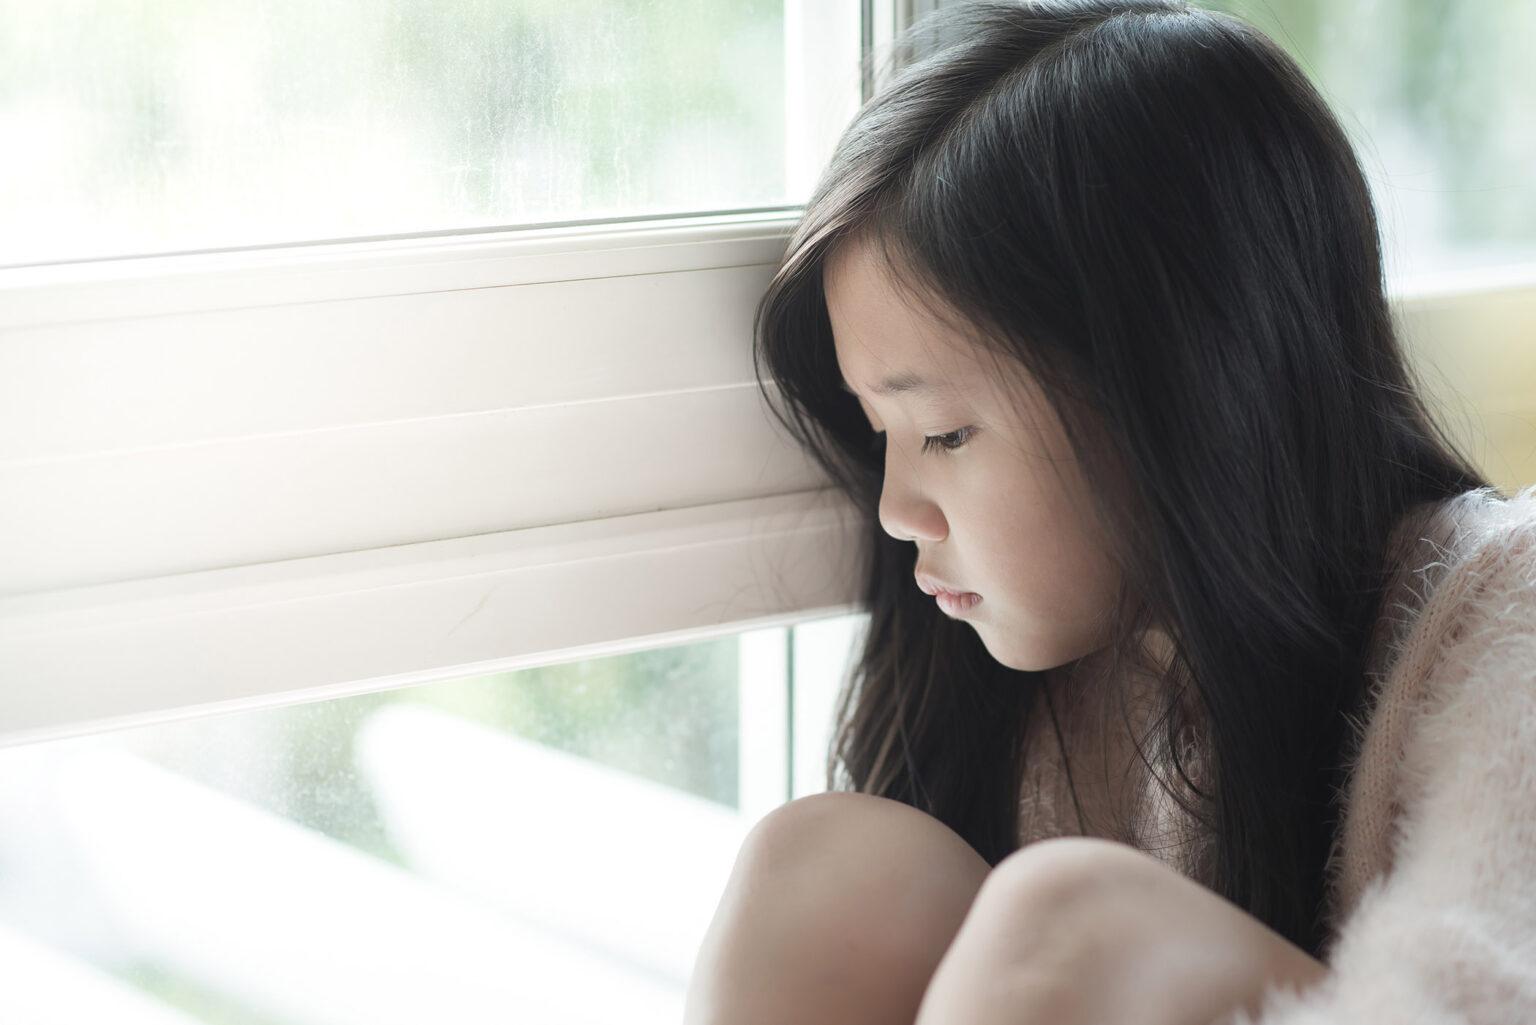 Child_Abuse_study-1536x1025.jpg